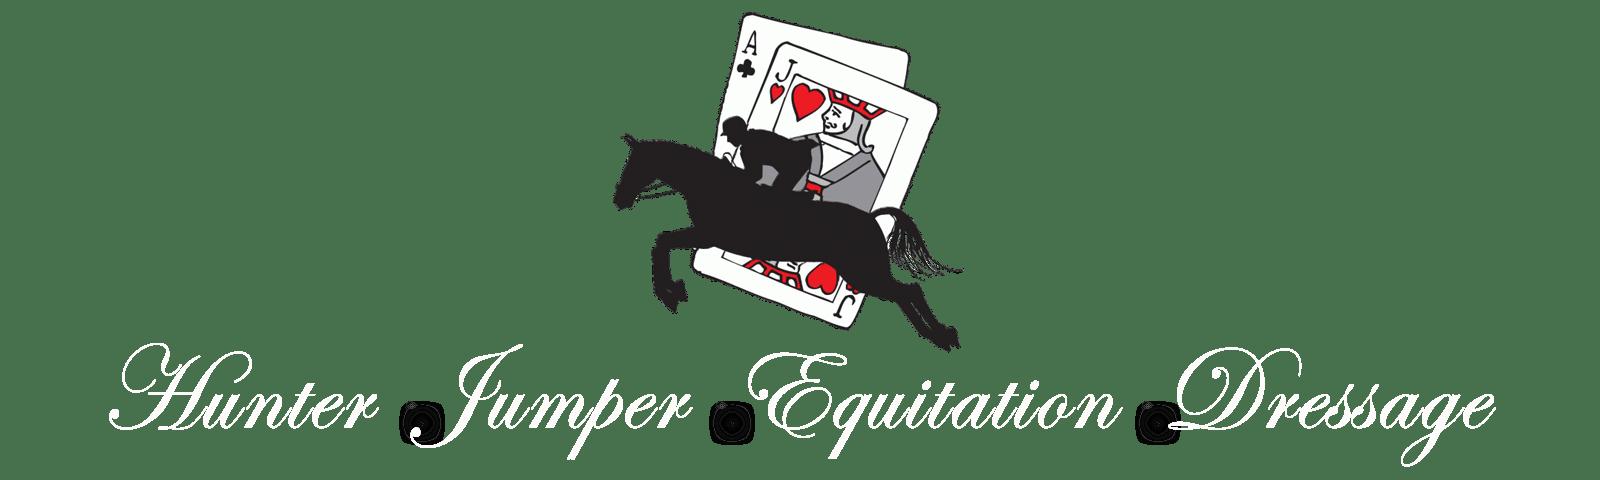 blackjack-logo-header